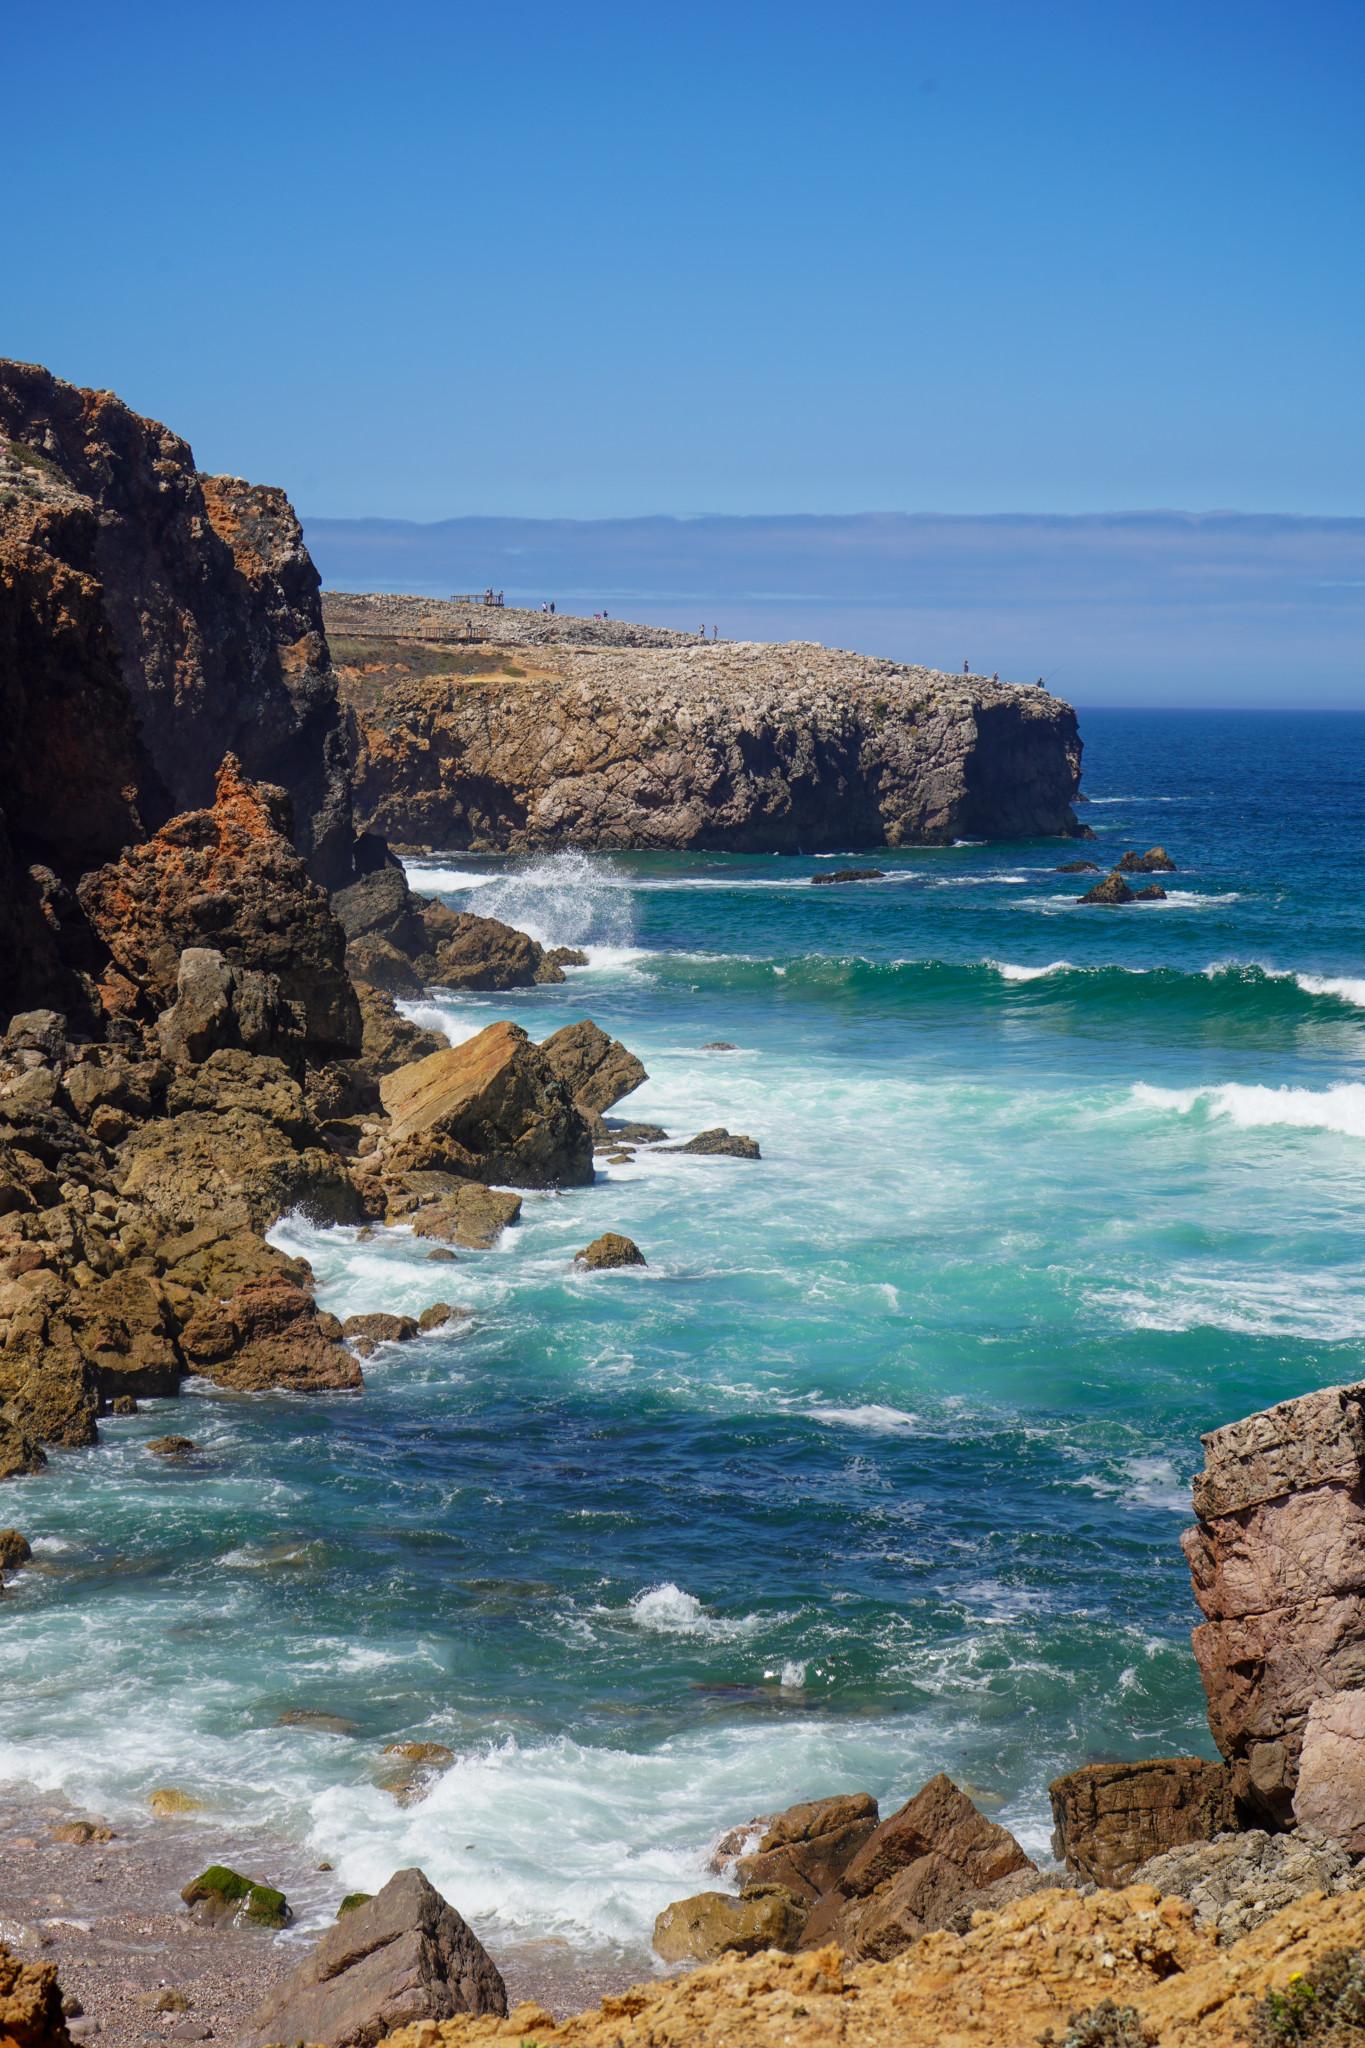 Unser bester Roadtrip in Europa? Die Algarve.